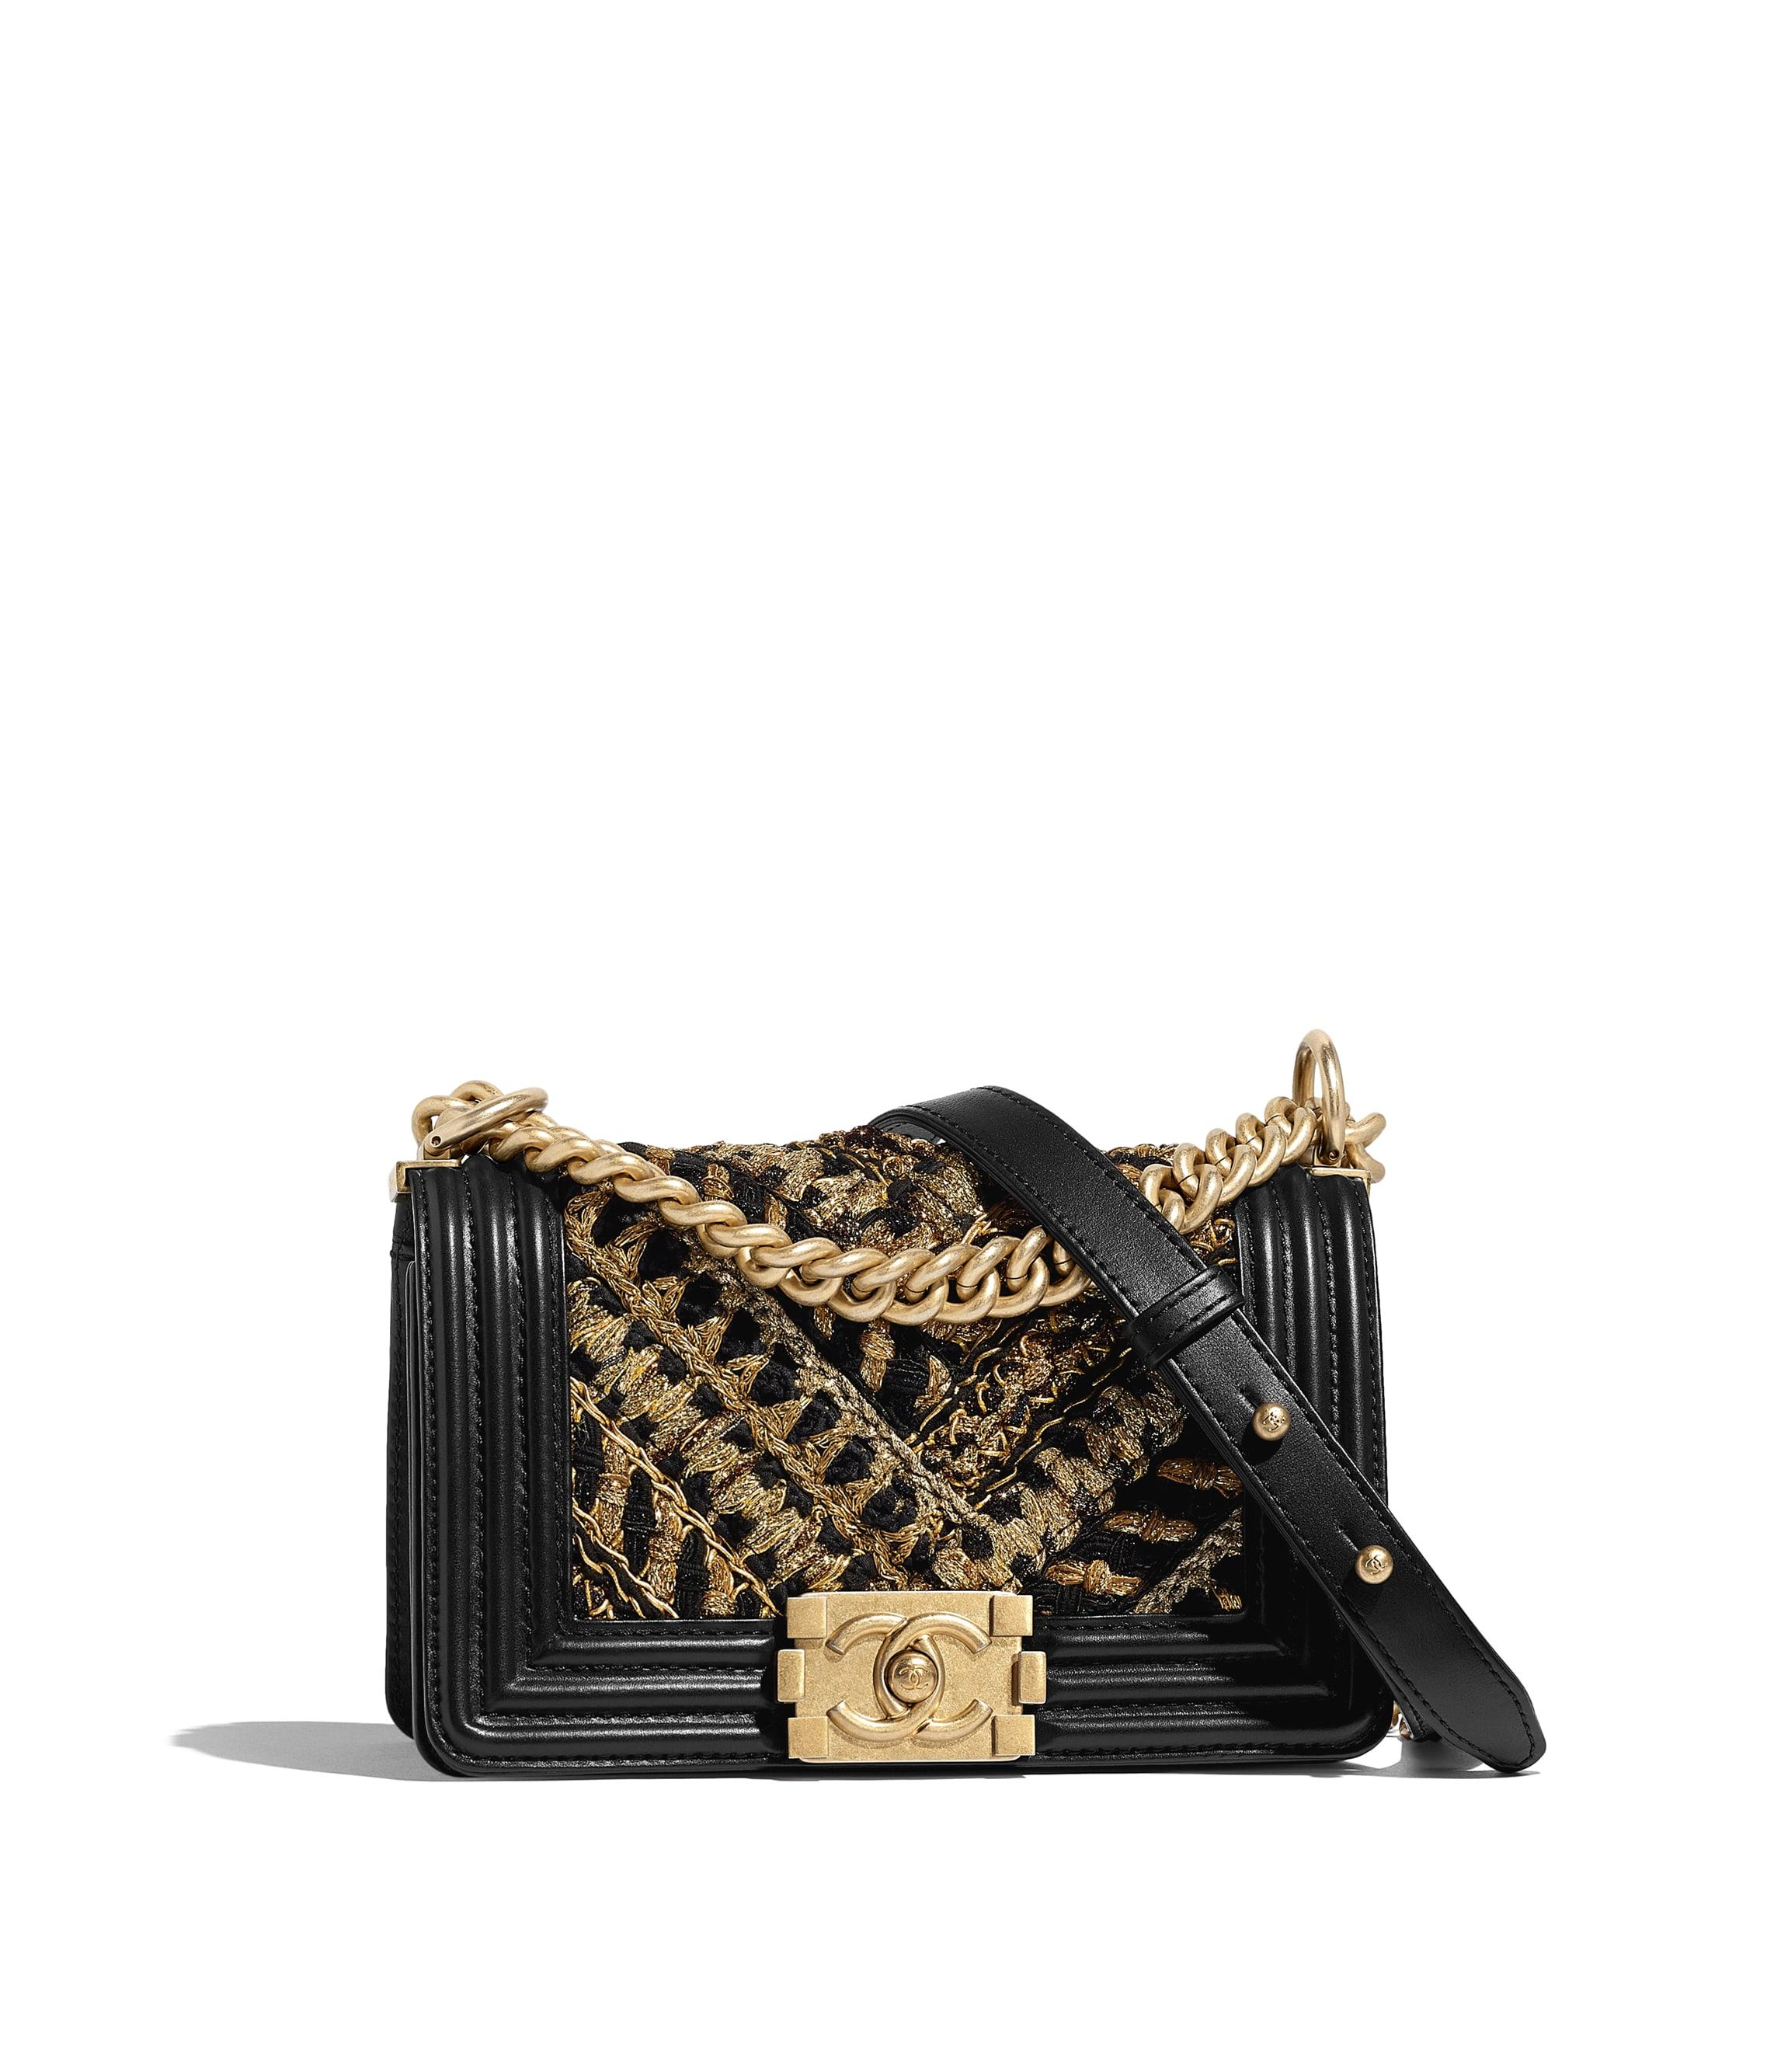 ab7cb4d8f1d89d BOY CHANEL - Handbags - CHANEL